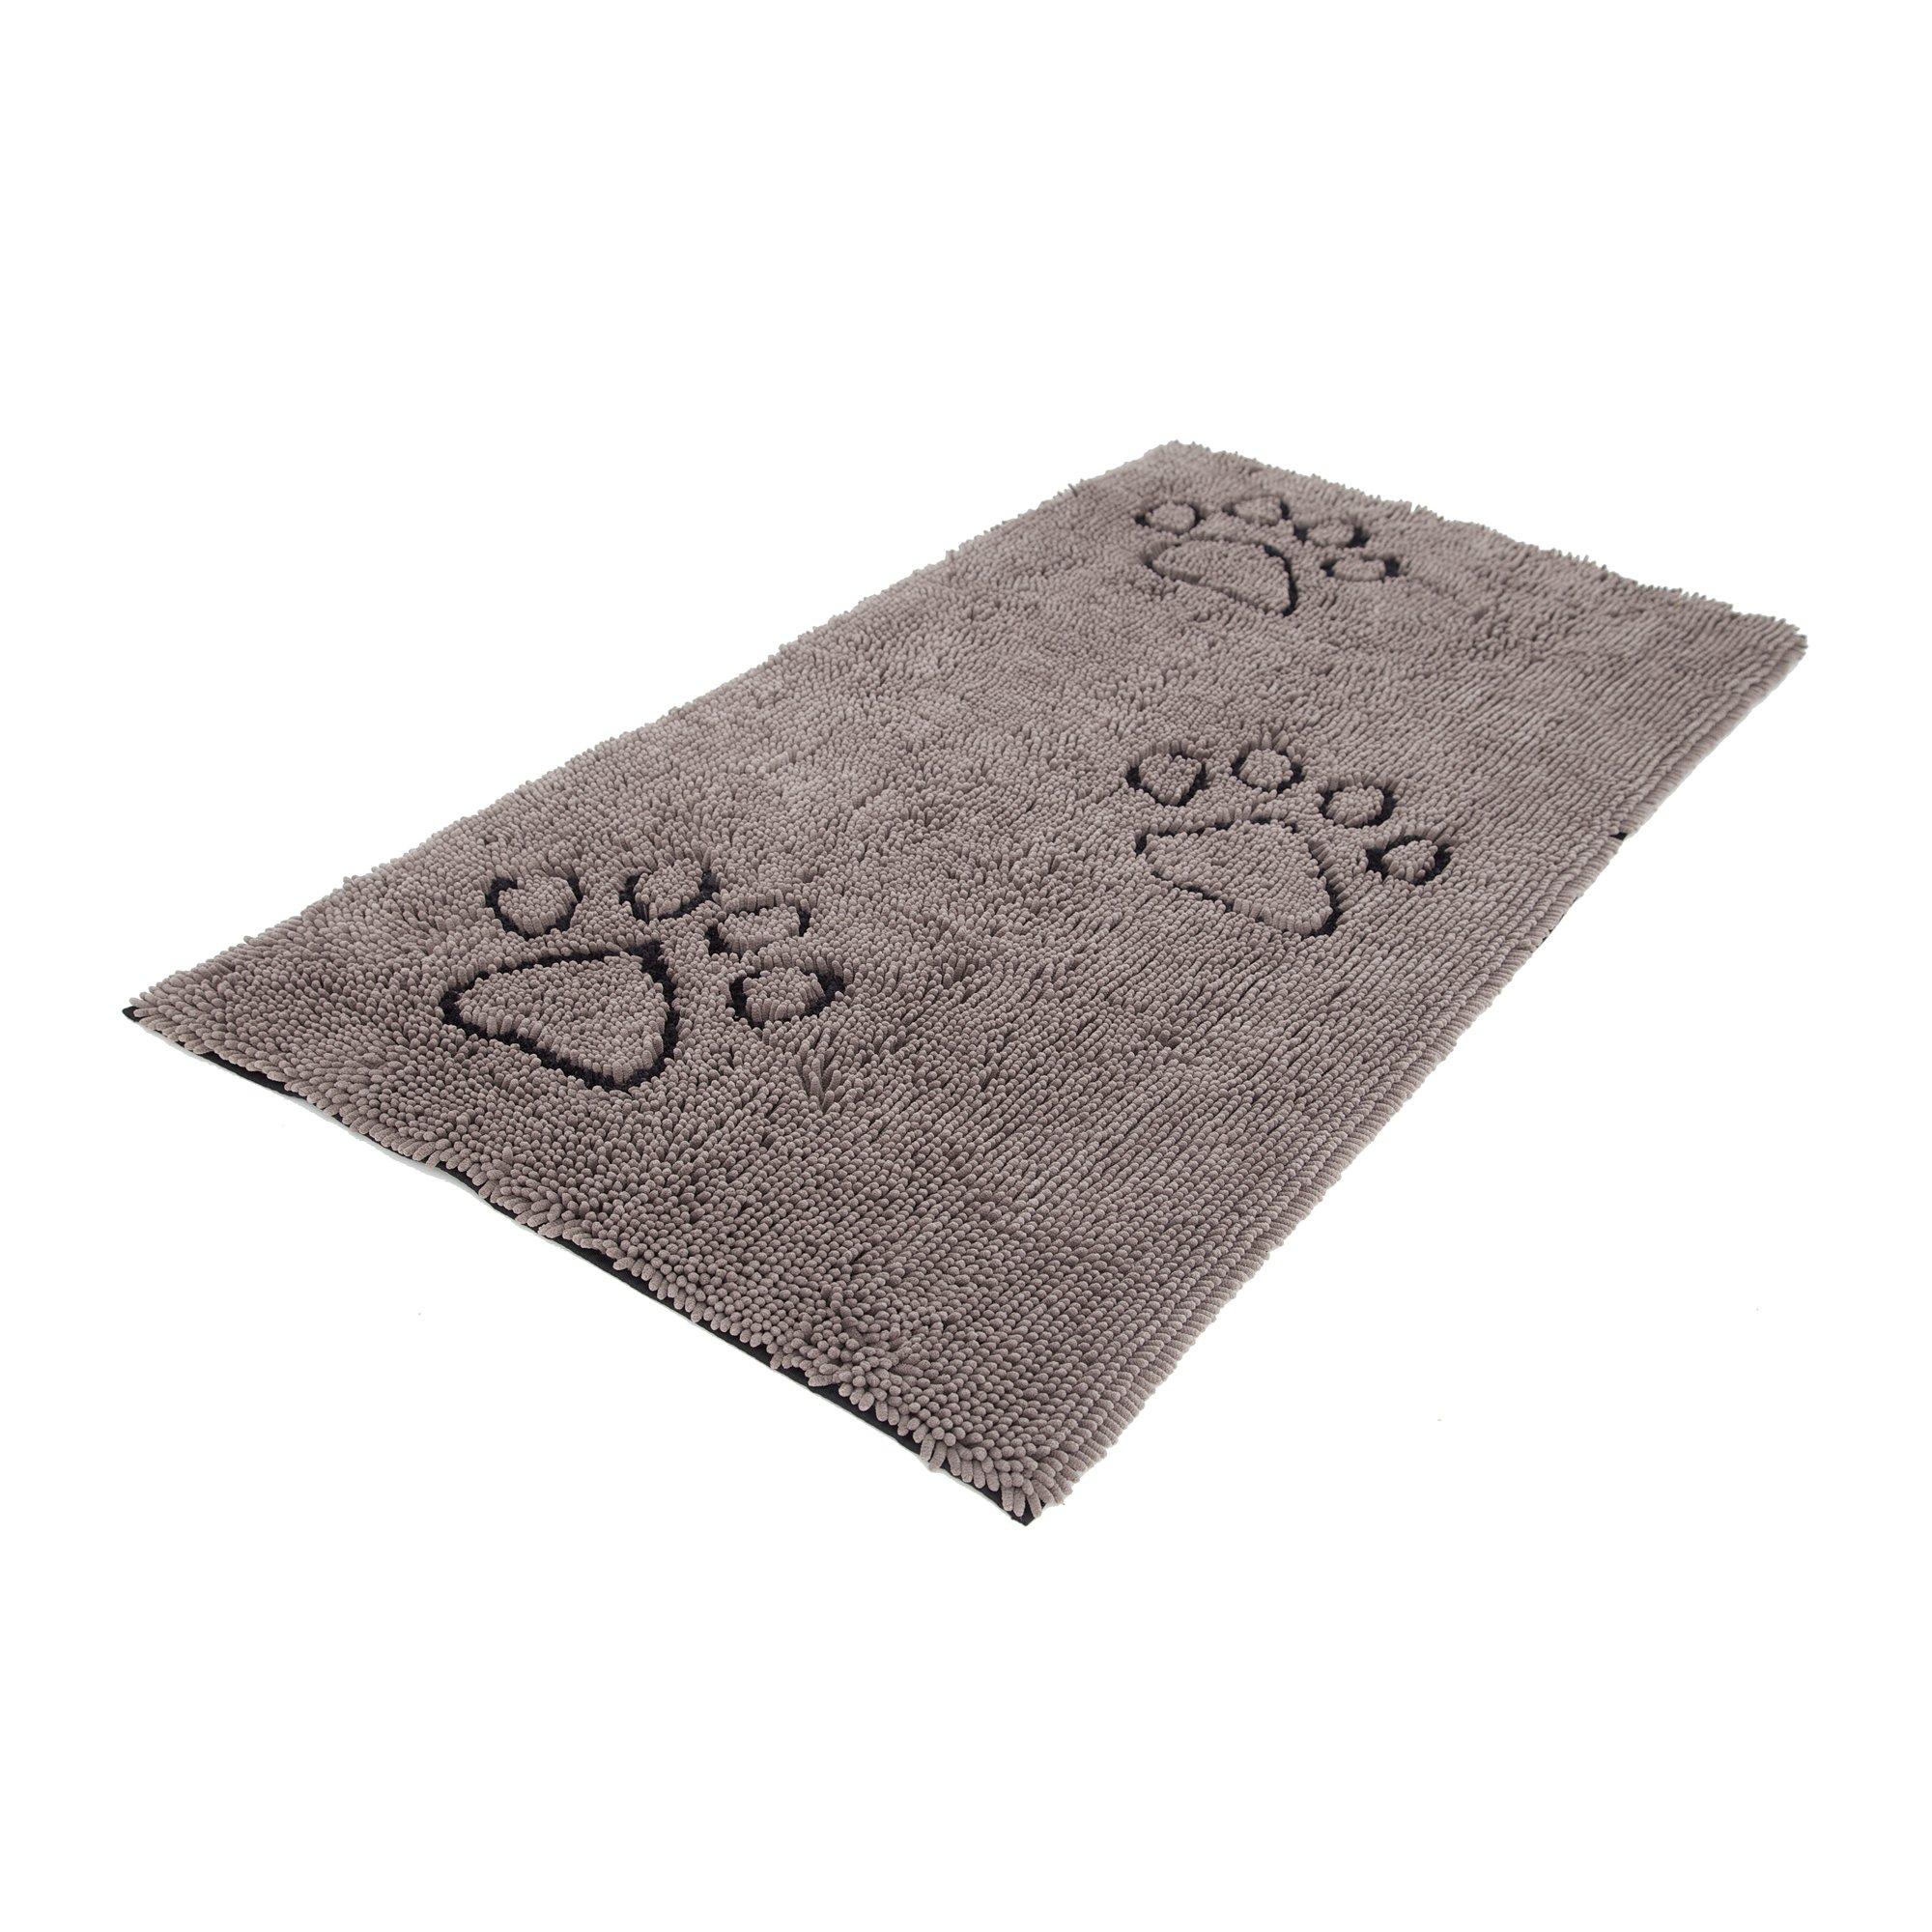 Dog Gone Smart Dirty Dog Doormat , Runner, Grey